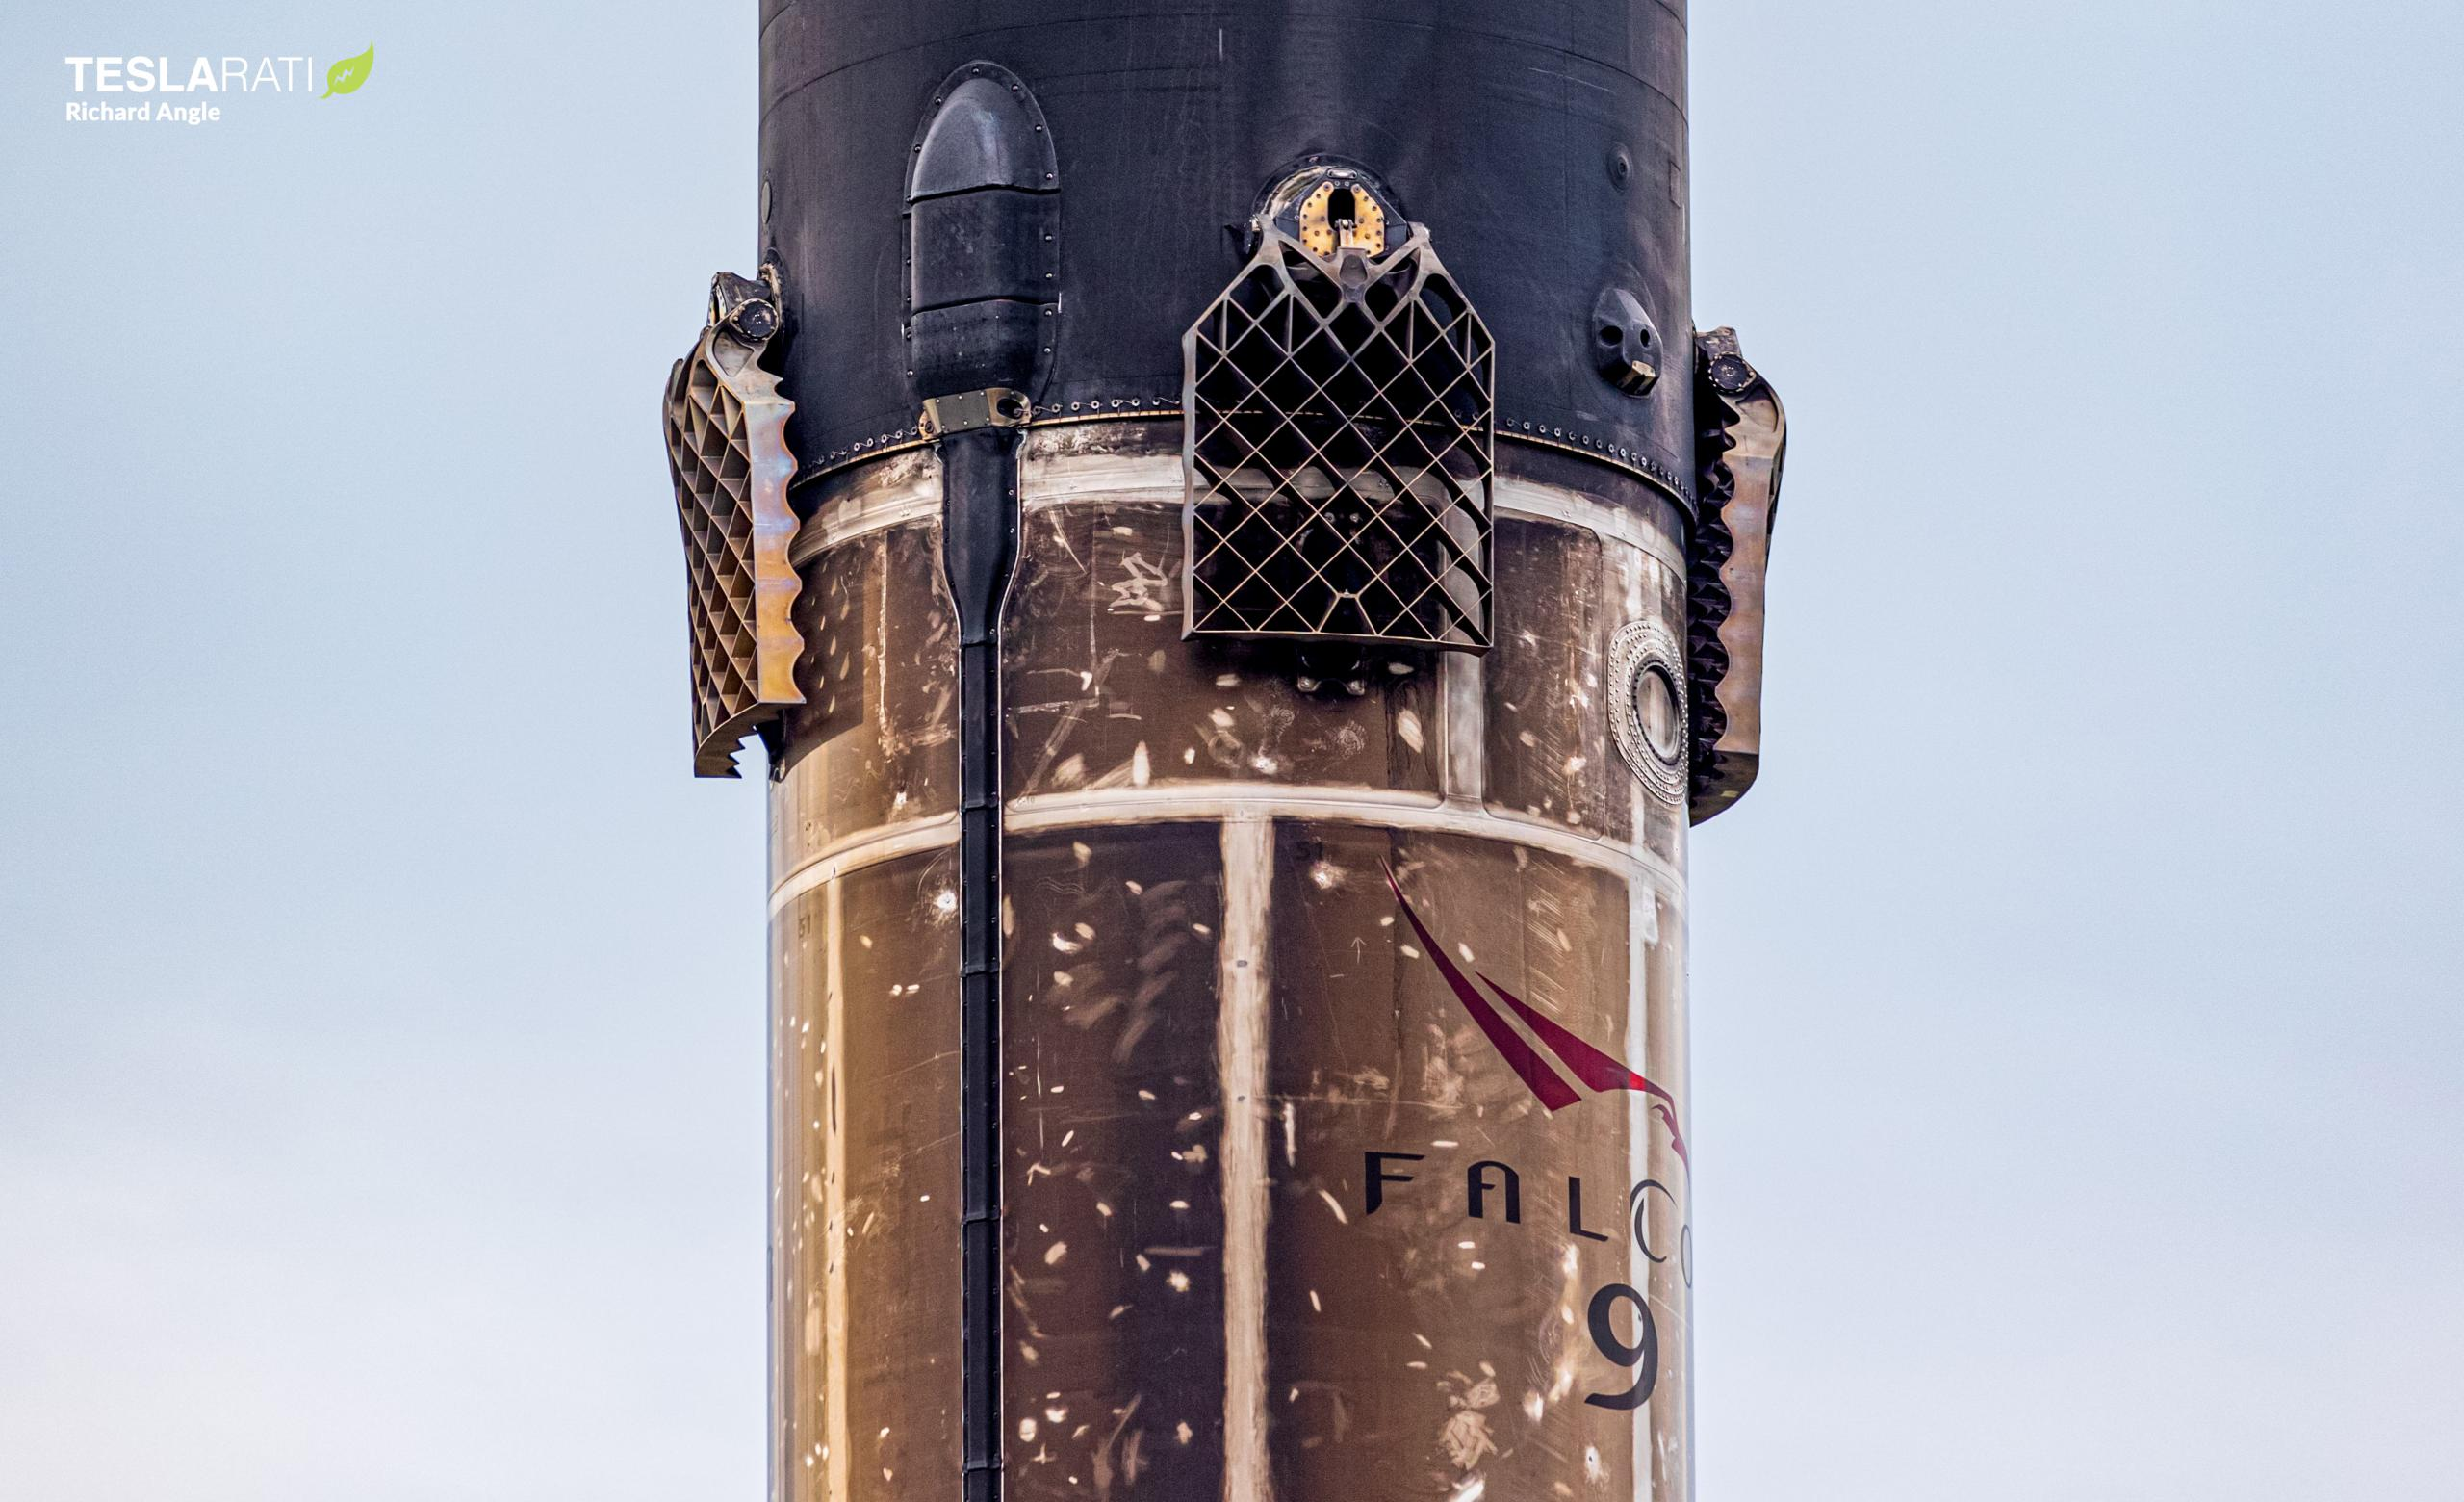 Starlink-27 Falcon 9 B1051 051221 (Richard Angle) port return 5 crop (c)